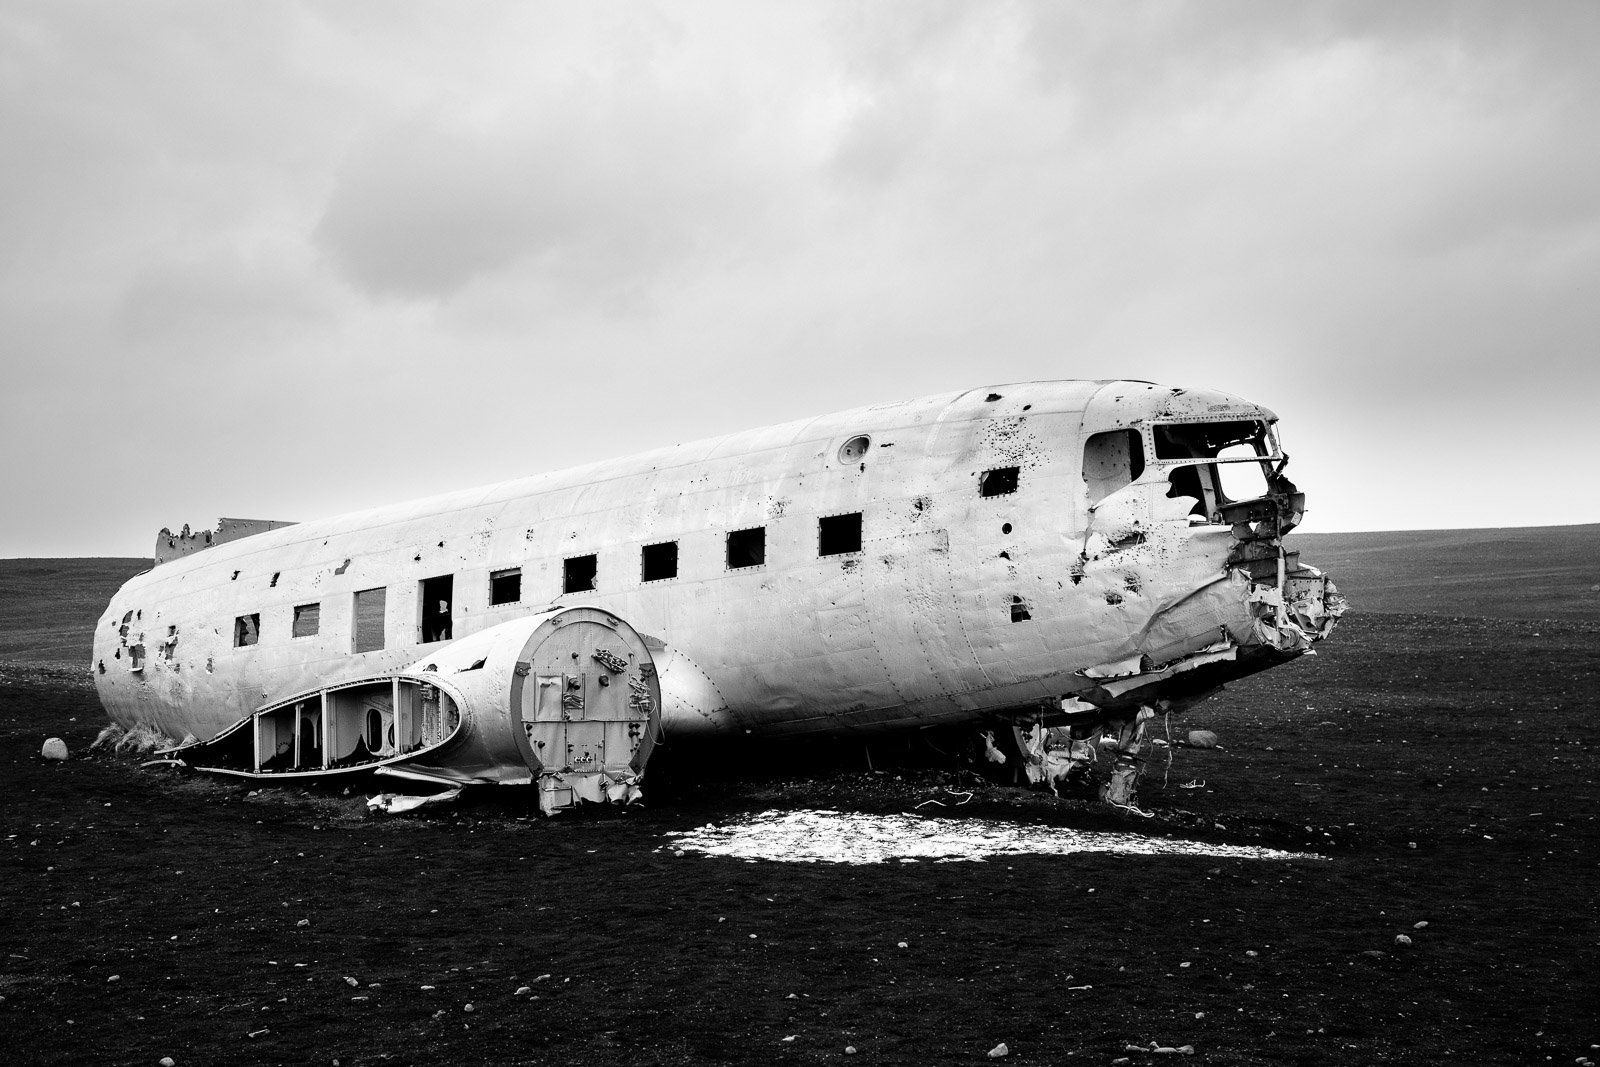 Island Flugzeugwrack